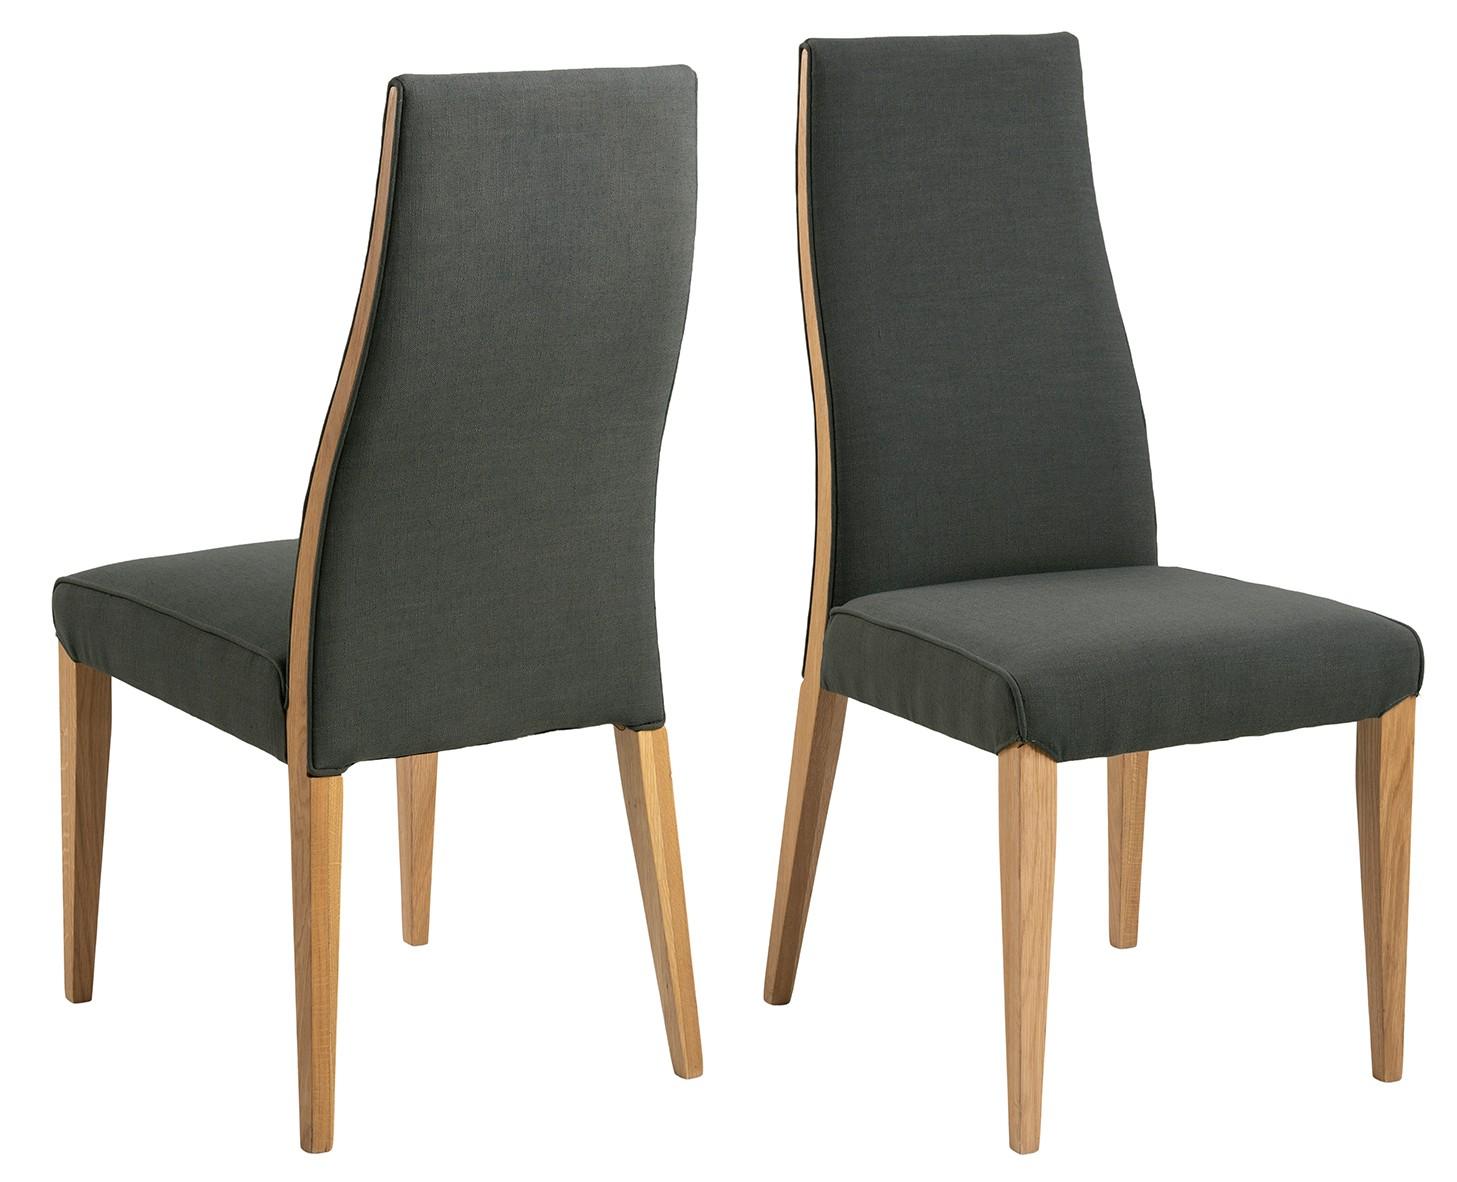 Bianca Spisebordsstole